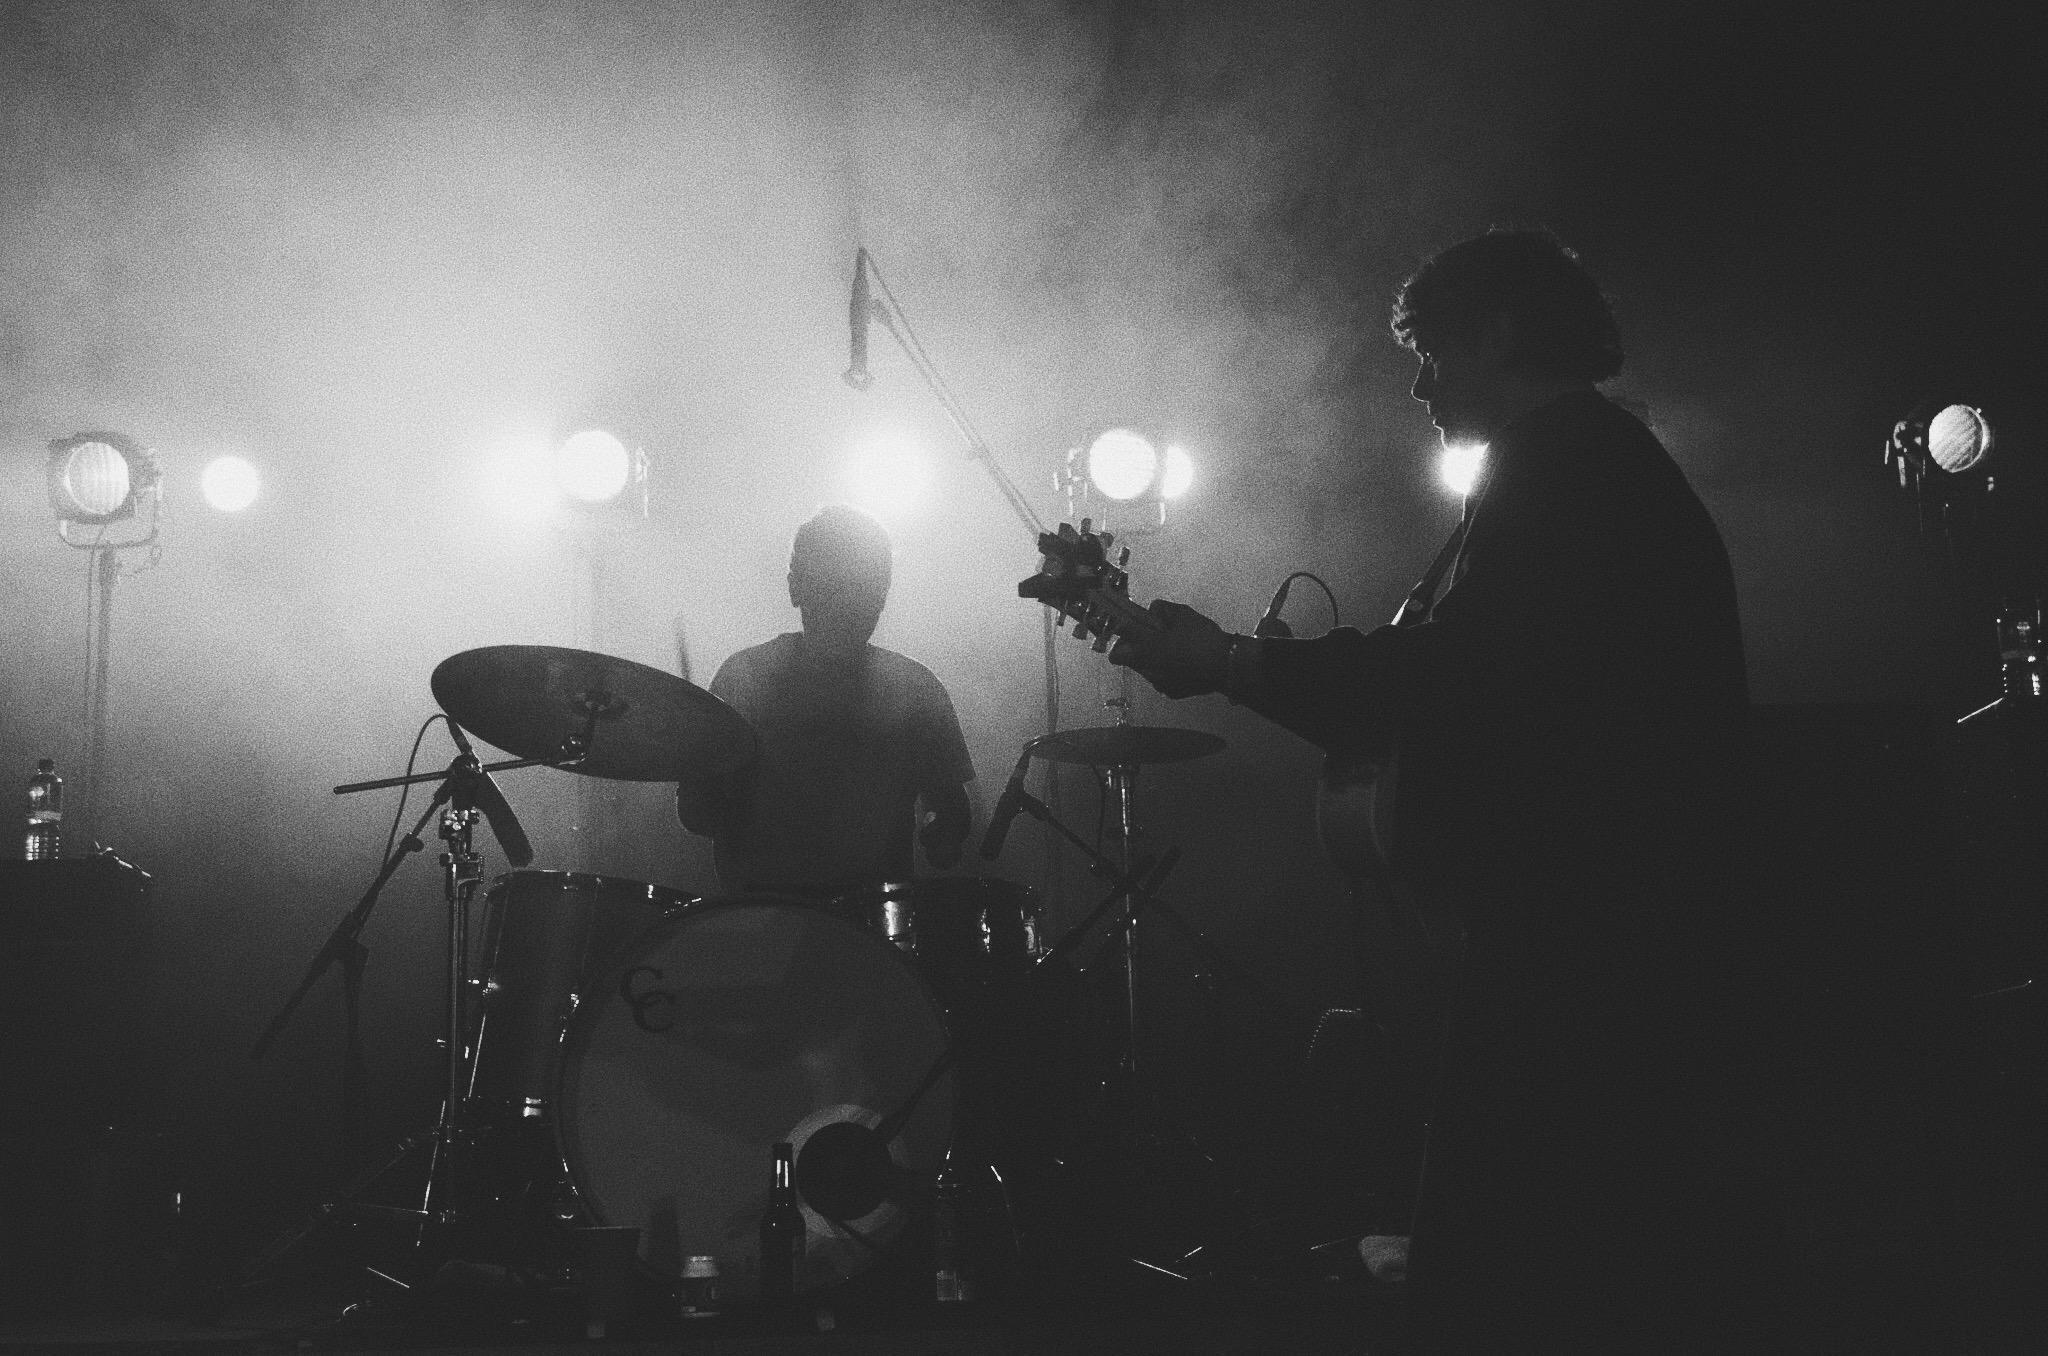 dmas music live review melbourne photo credit ryley clarke savage thrills savagethrills 2